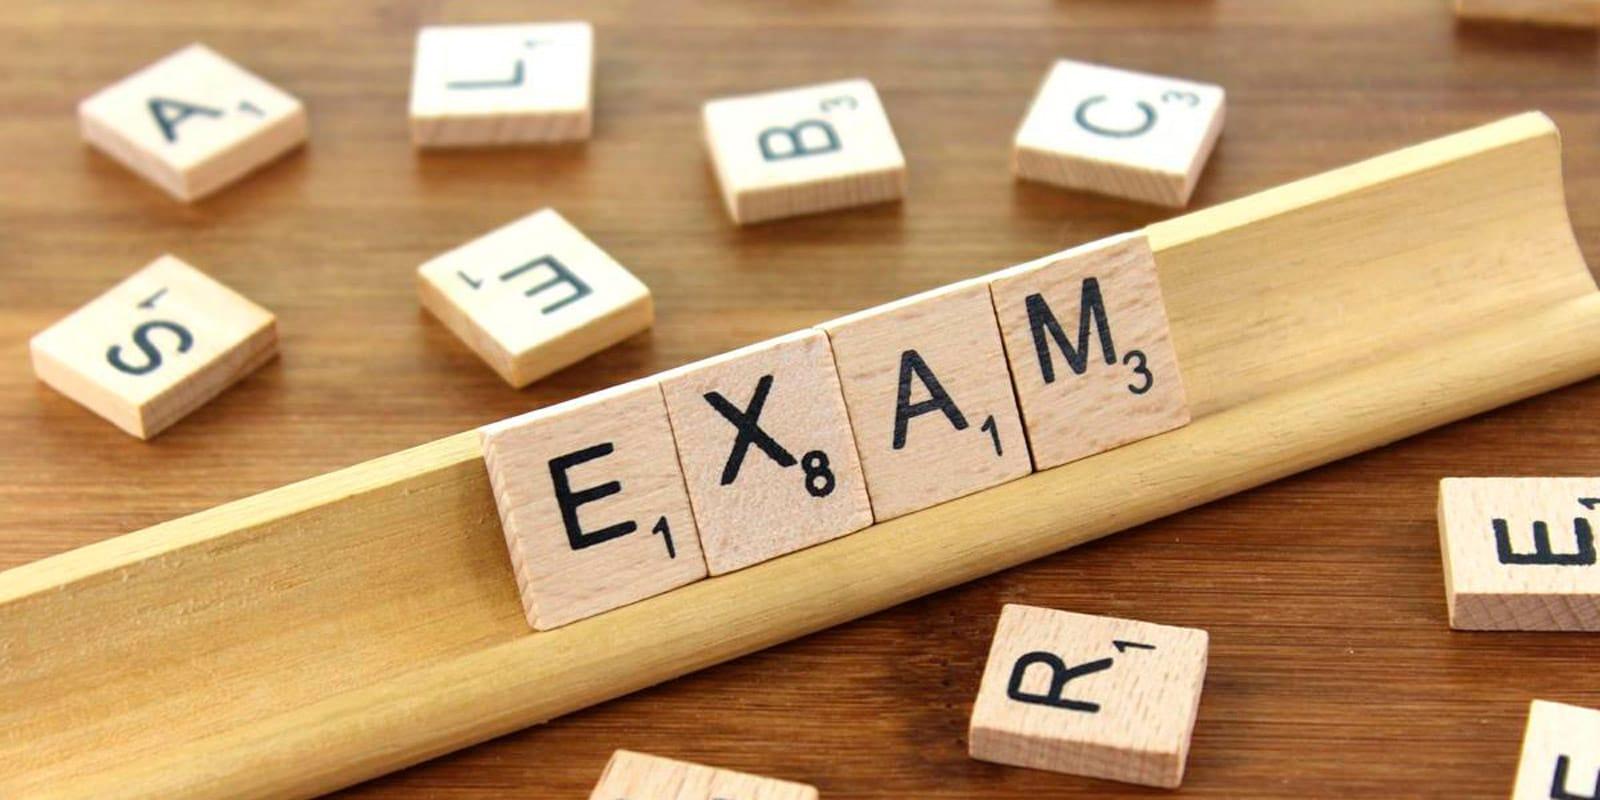 Exams WhatsApp Group Names